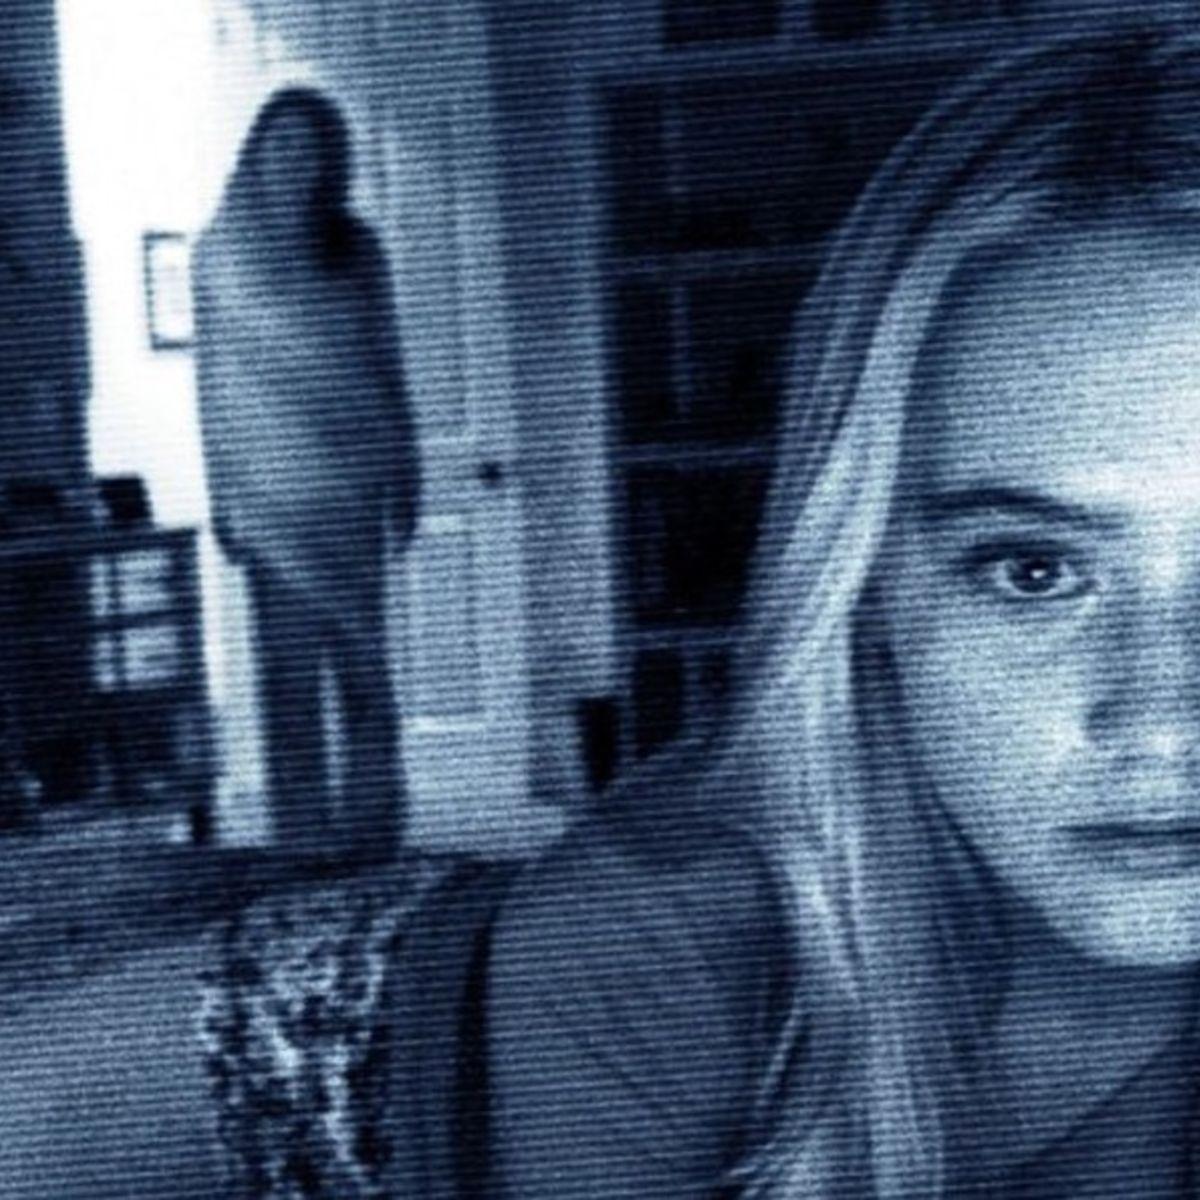 paranormal-activity-4-1600.jpg